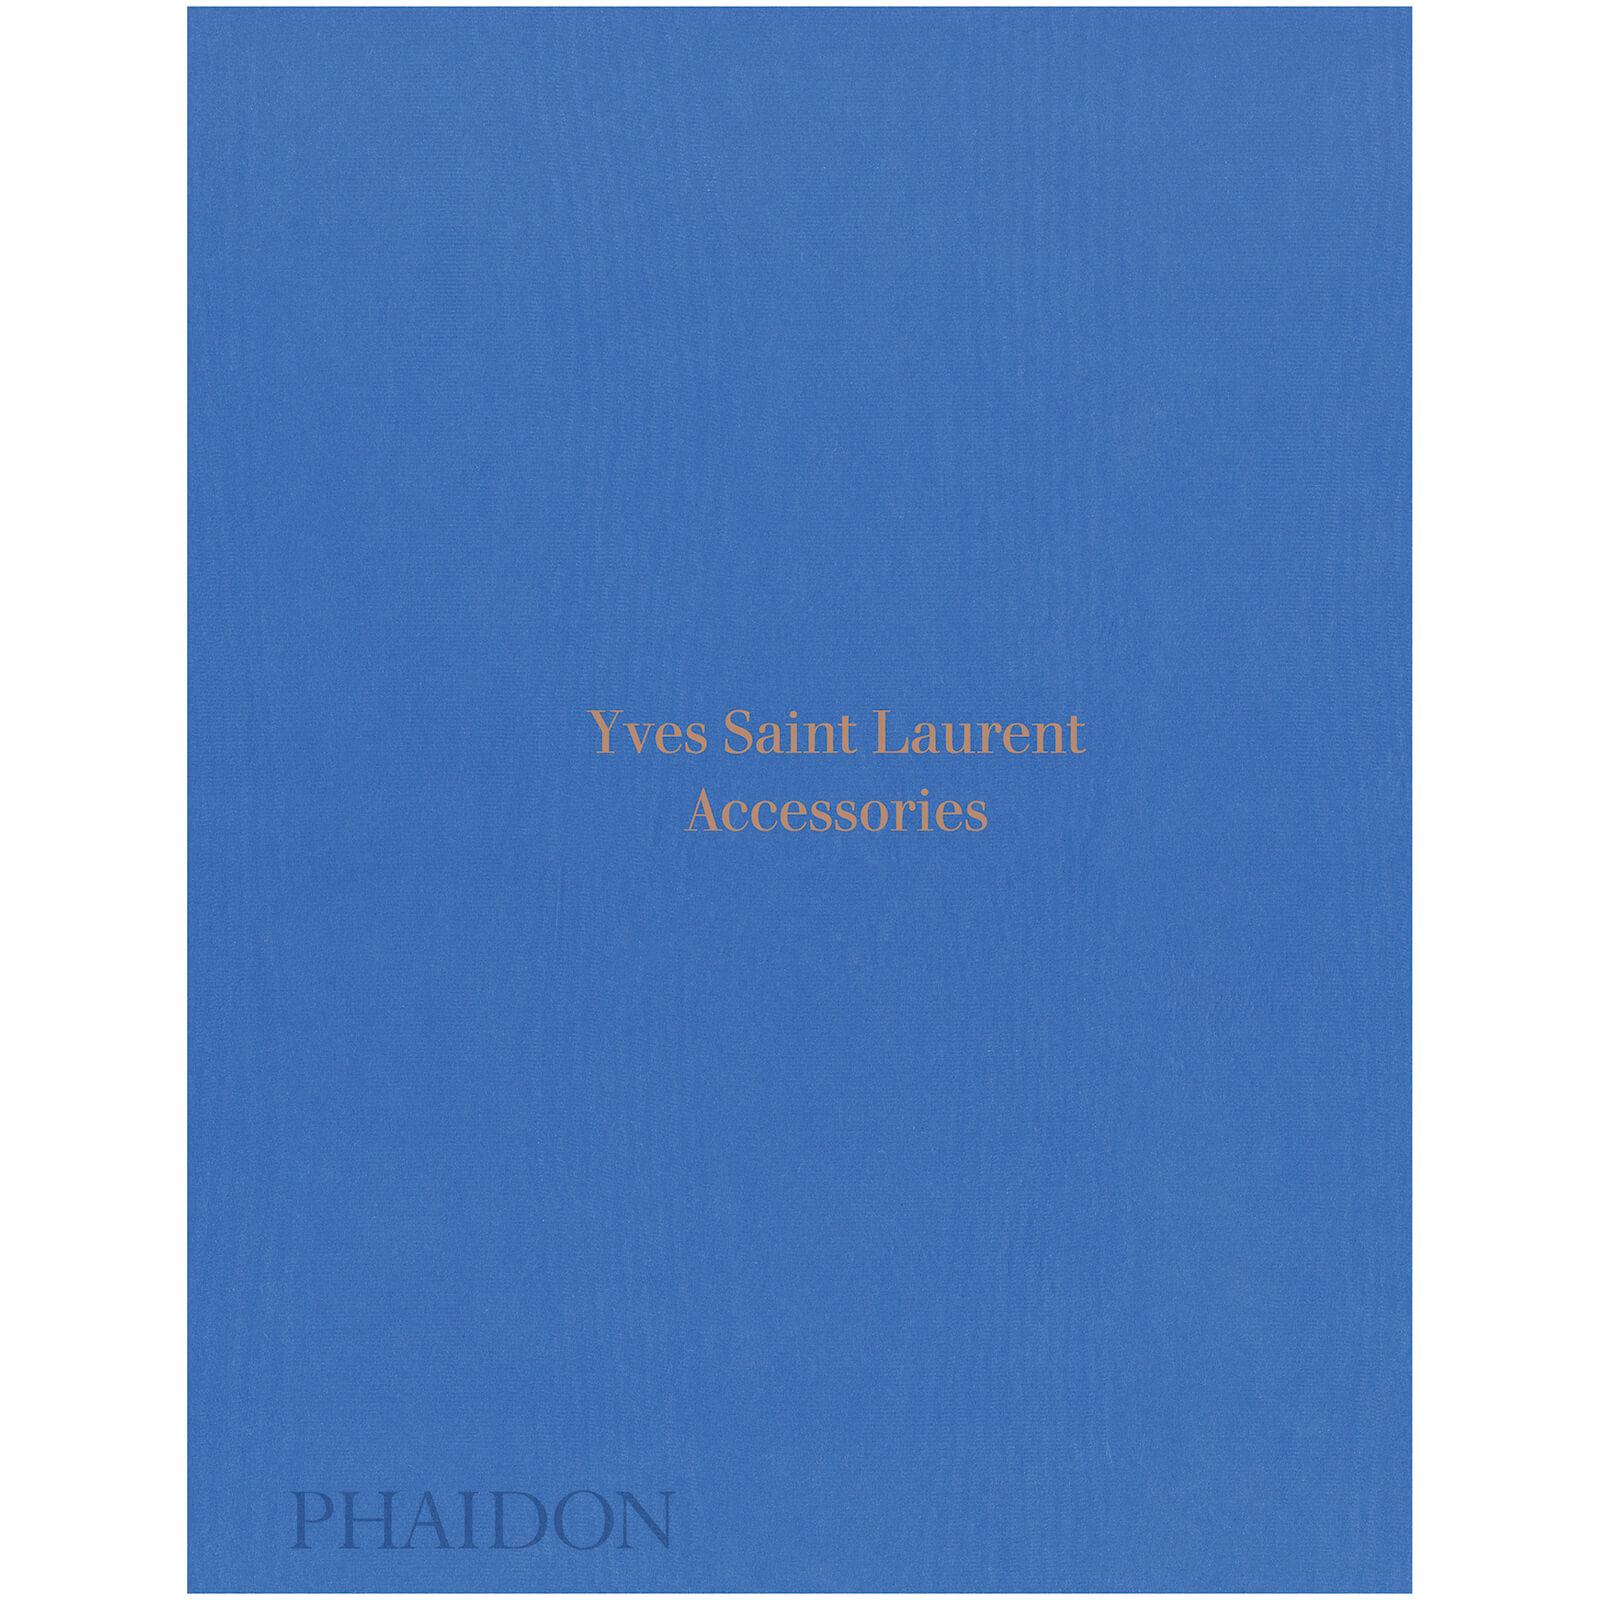 Phaidon Books: Yves Saint Laurent Accessories